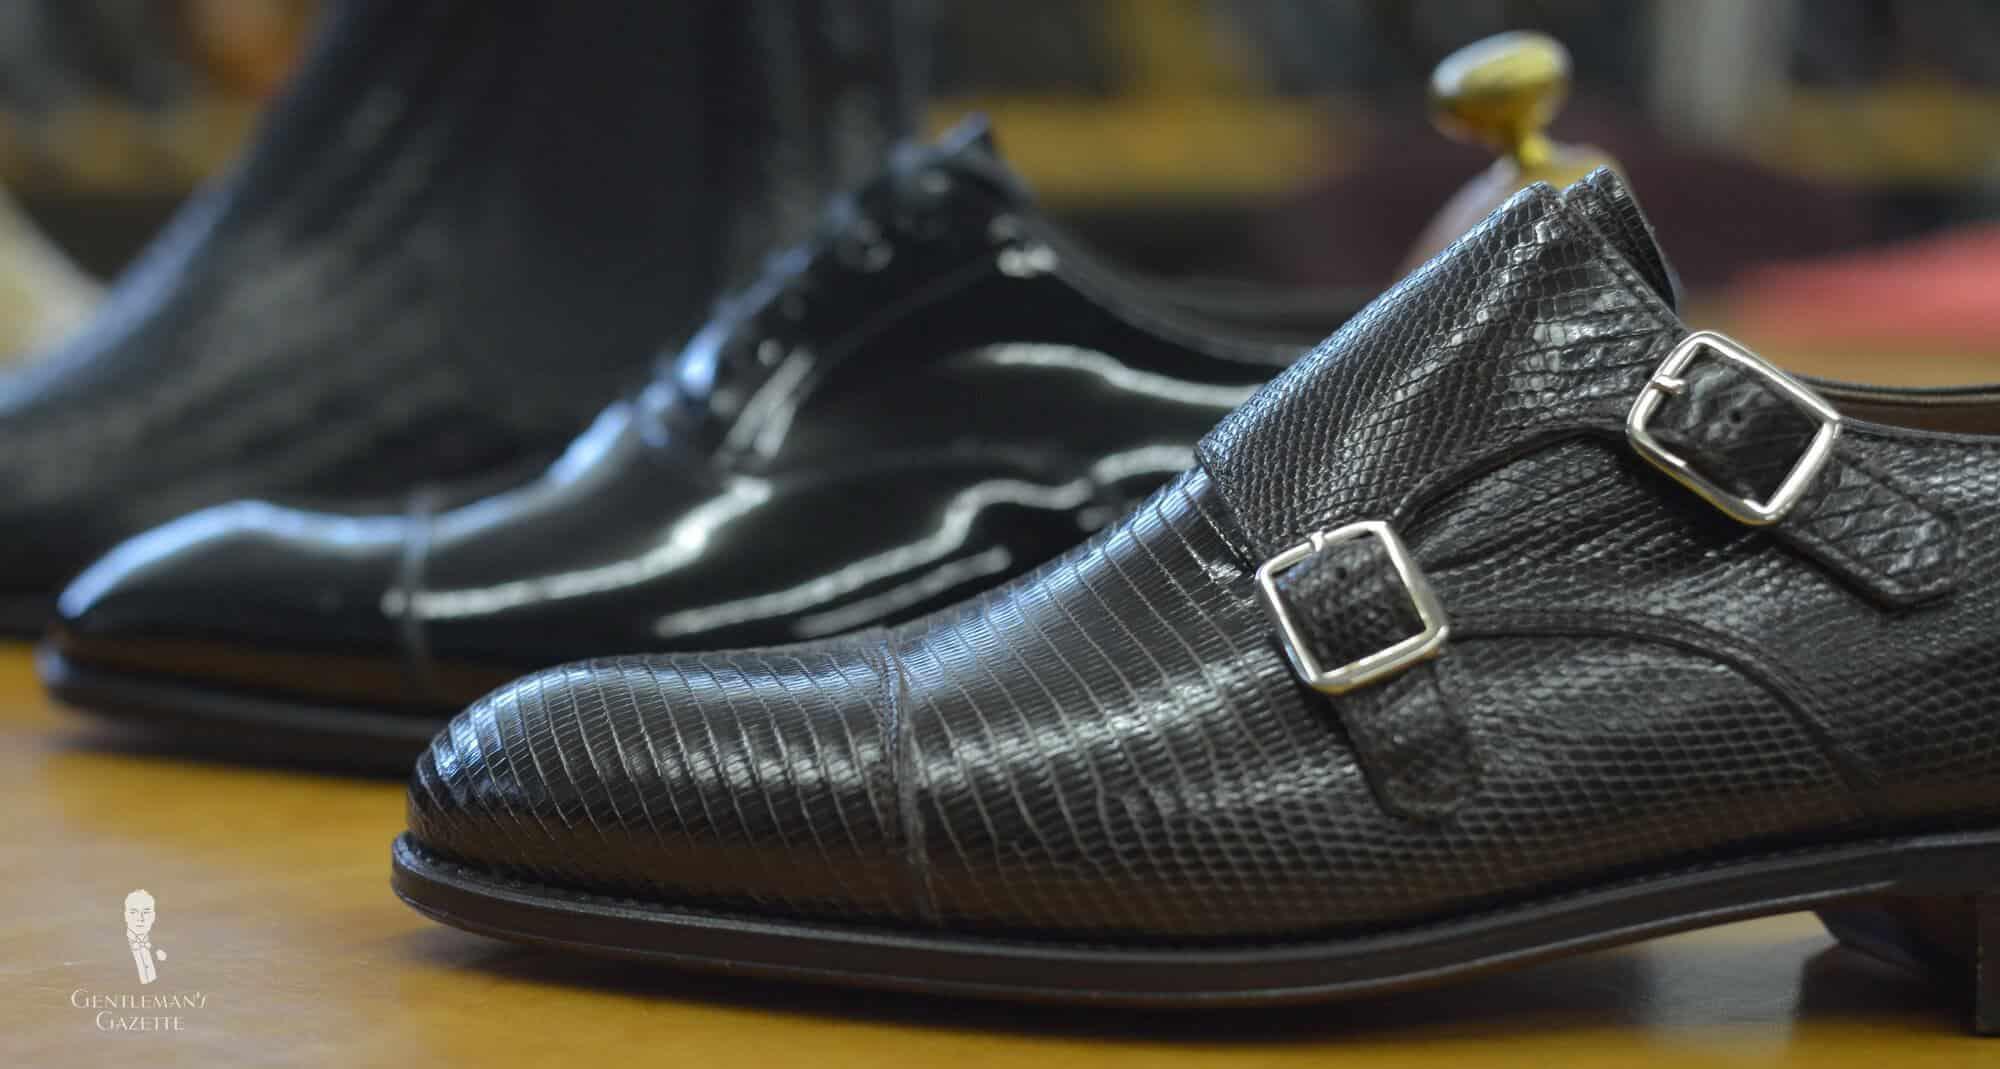 John Lobb Shoes >> Monk Strap Shoes & Double Monks Guide — Gentleman's Gazette